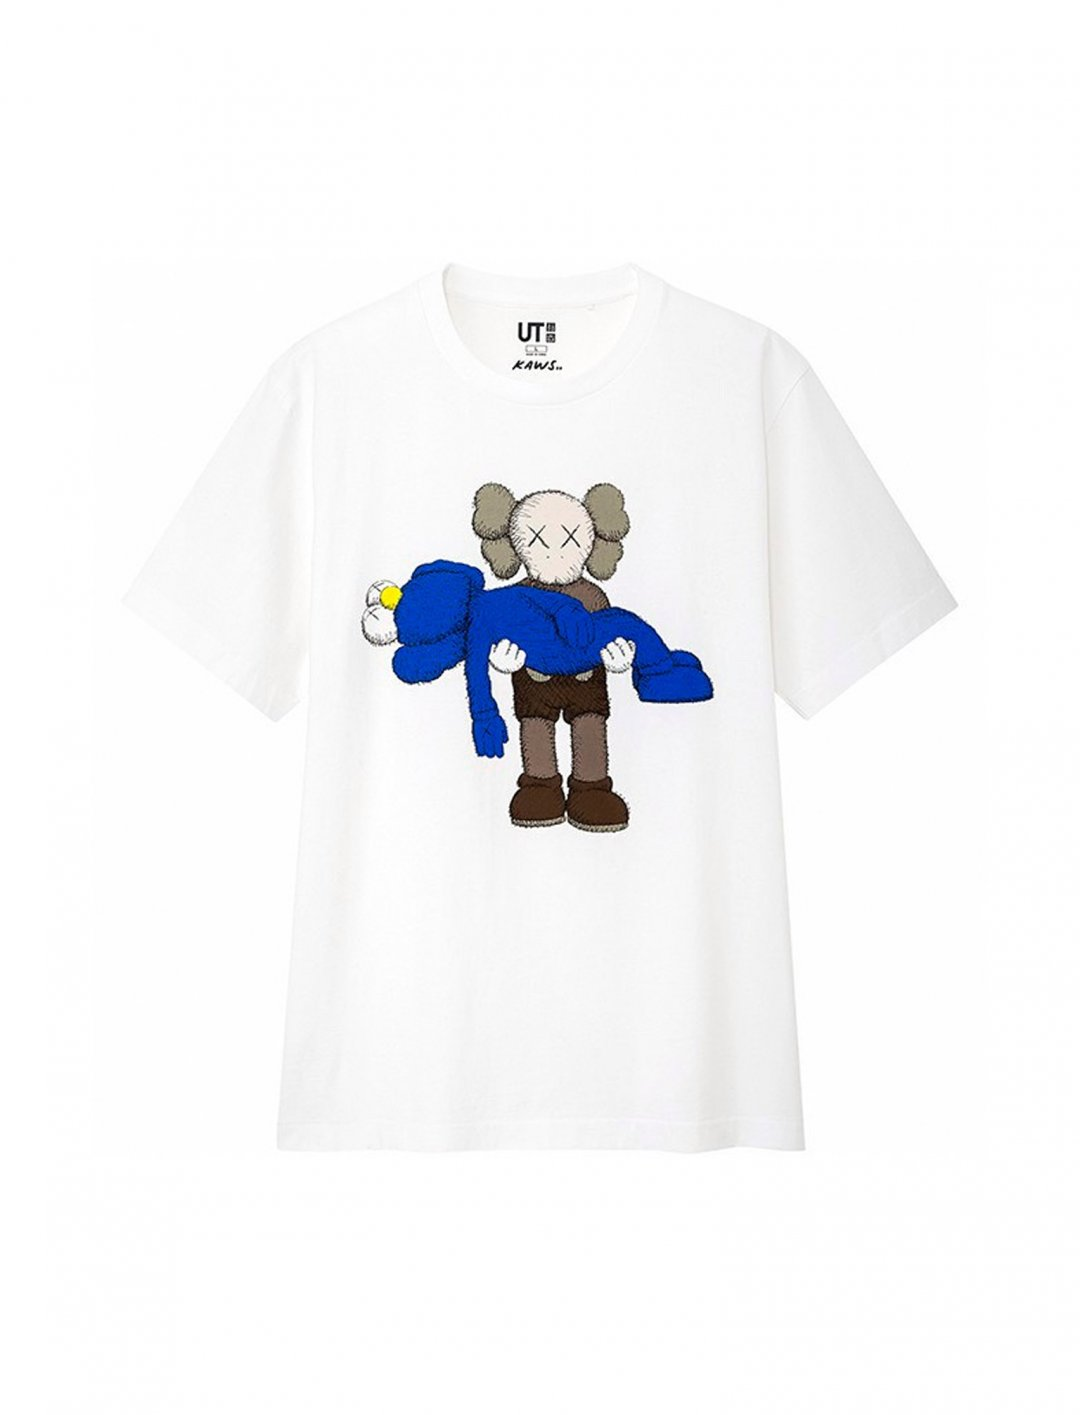 "Kaws Graphic T-shirt {""id"":5,""product_section_id"":1,""name"":""Clothing"",""order"":5} Kaws x Uniqlo"